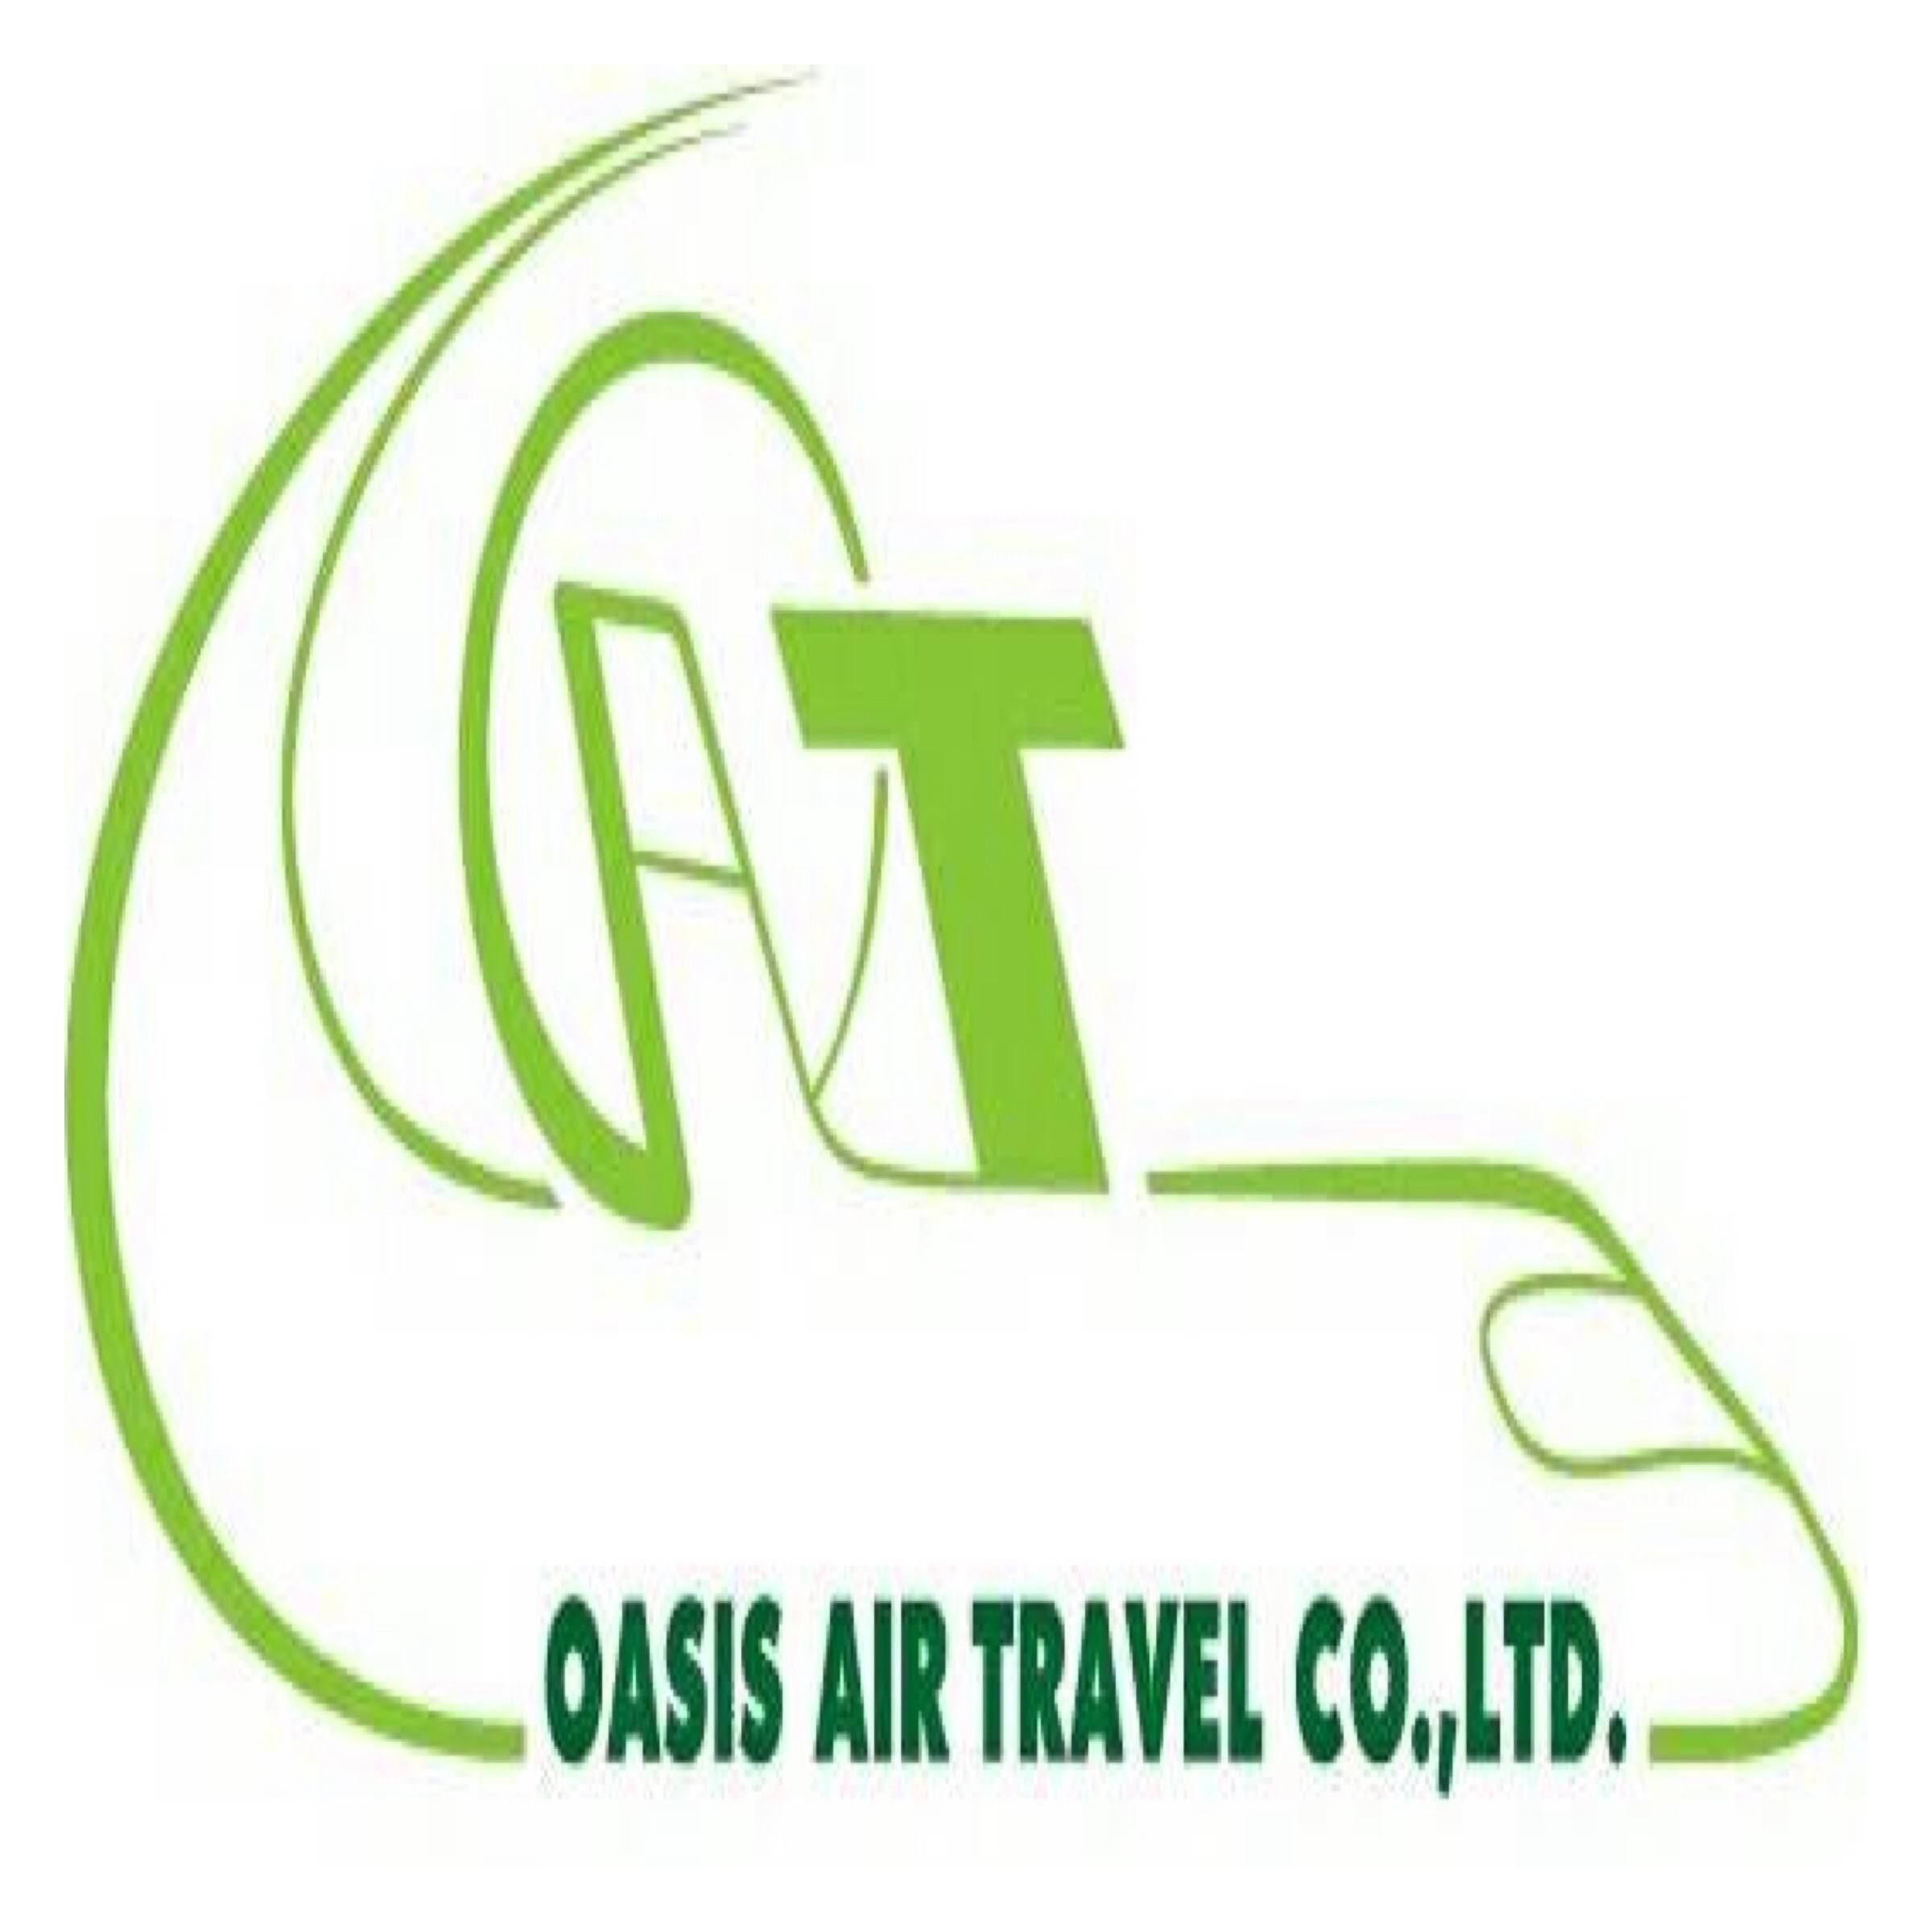 Oasis Air Travel